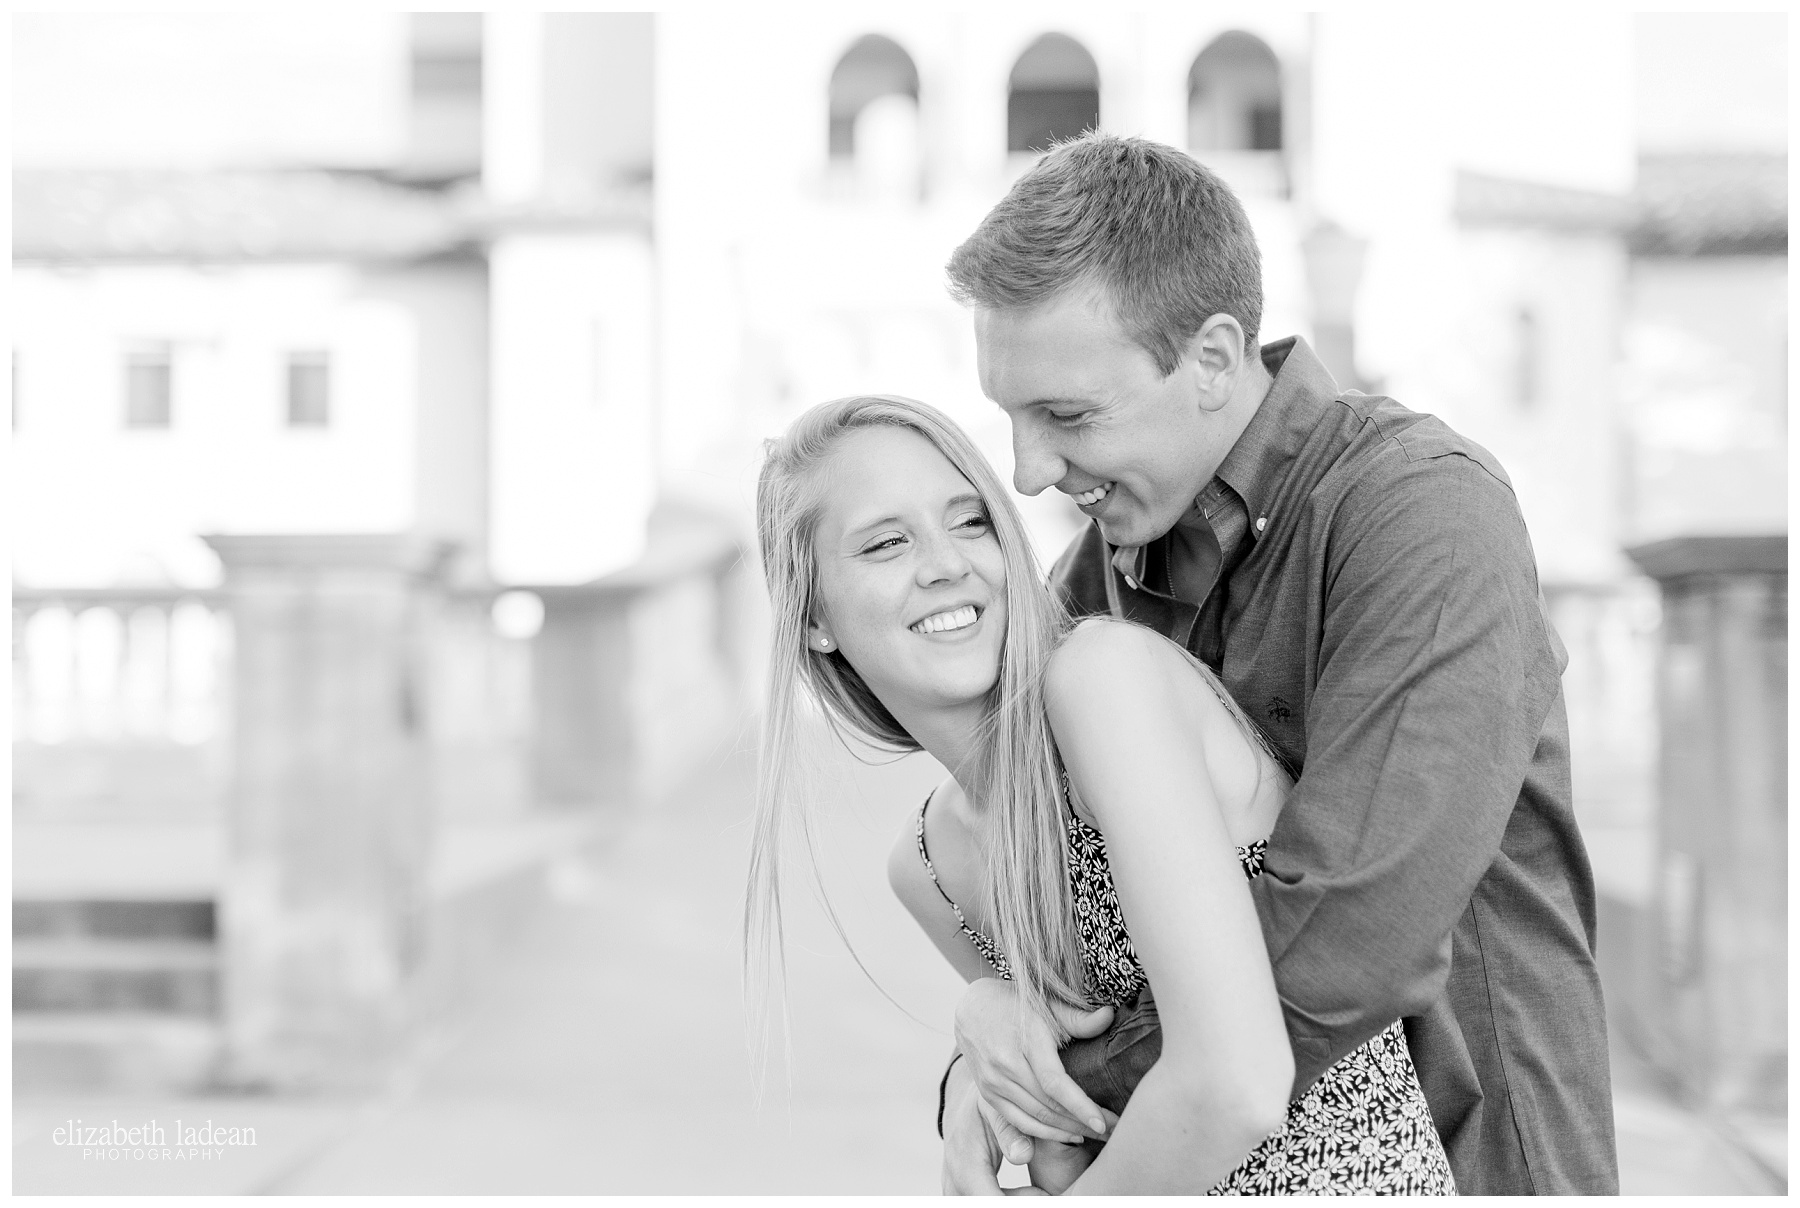 Engagement-Photos-Unity-Village-KC-Photography-A+R-Elizabeth-Ladean-Photography-photo_1372.jpg